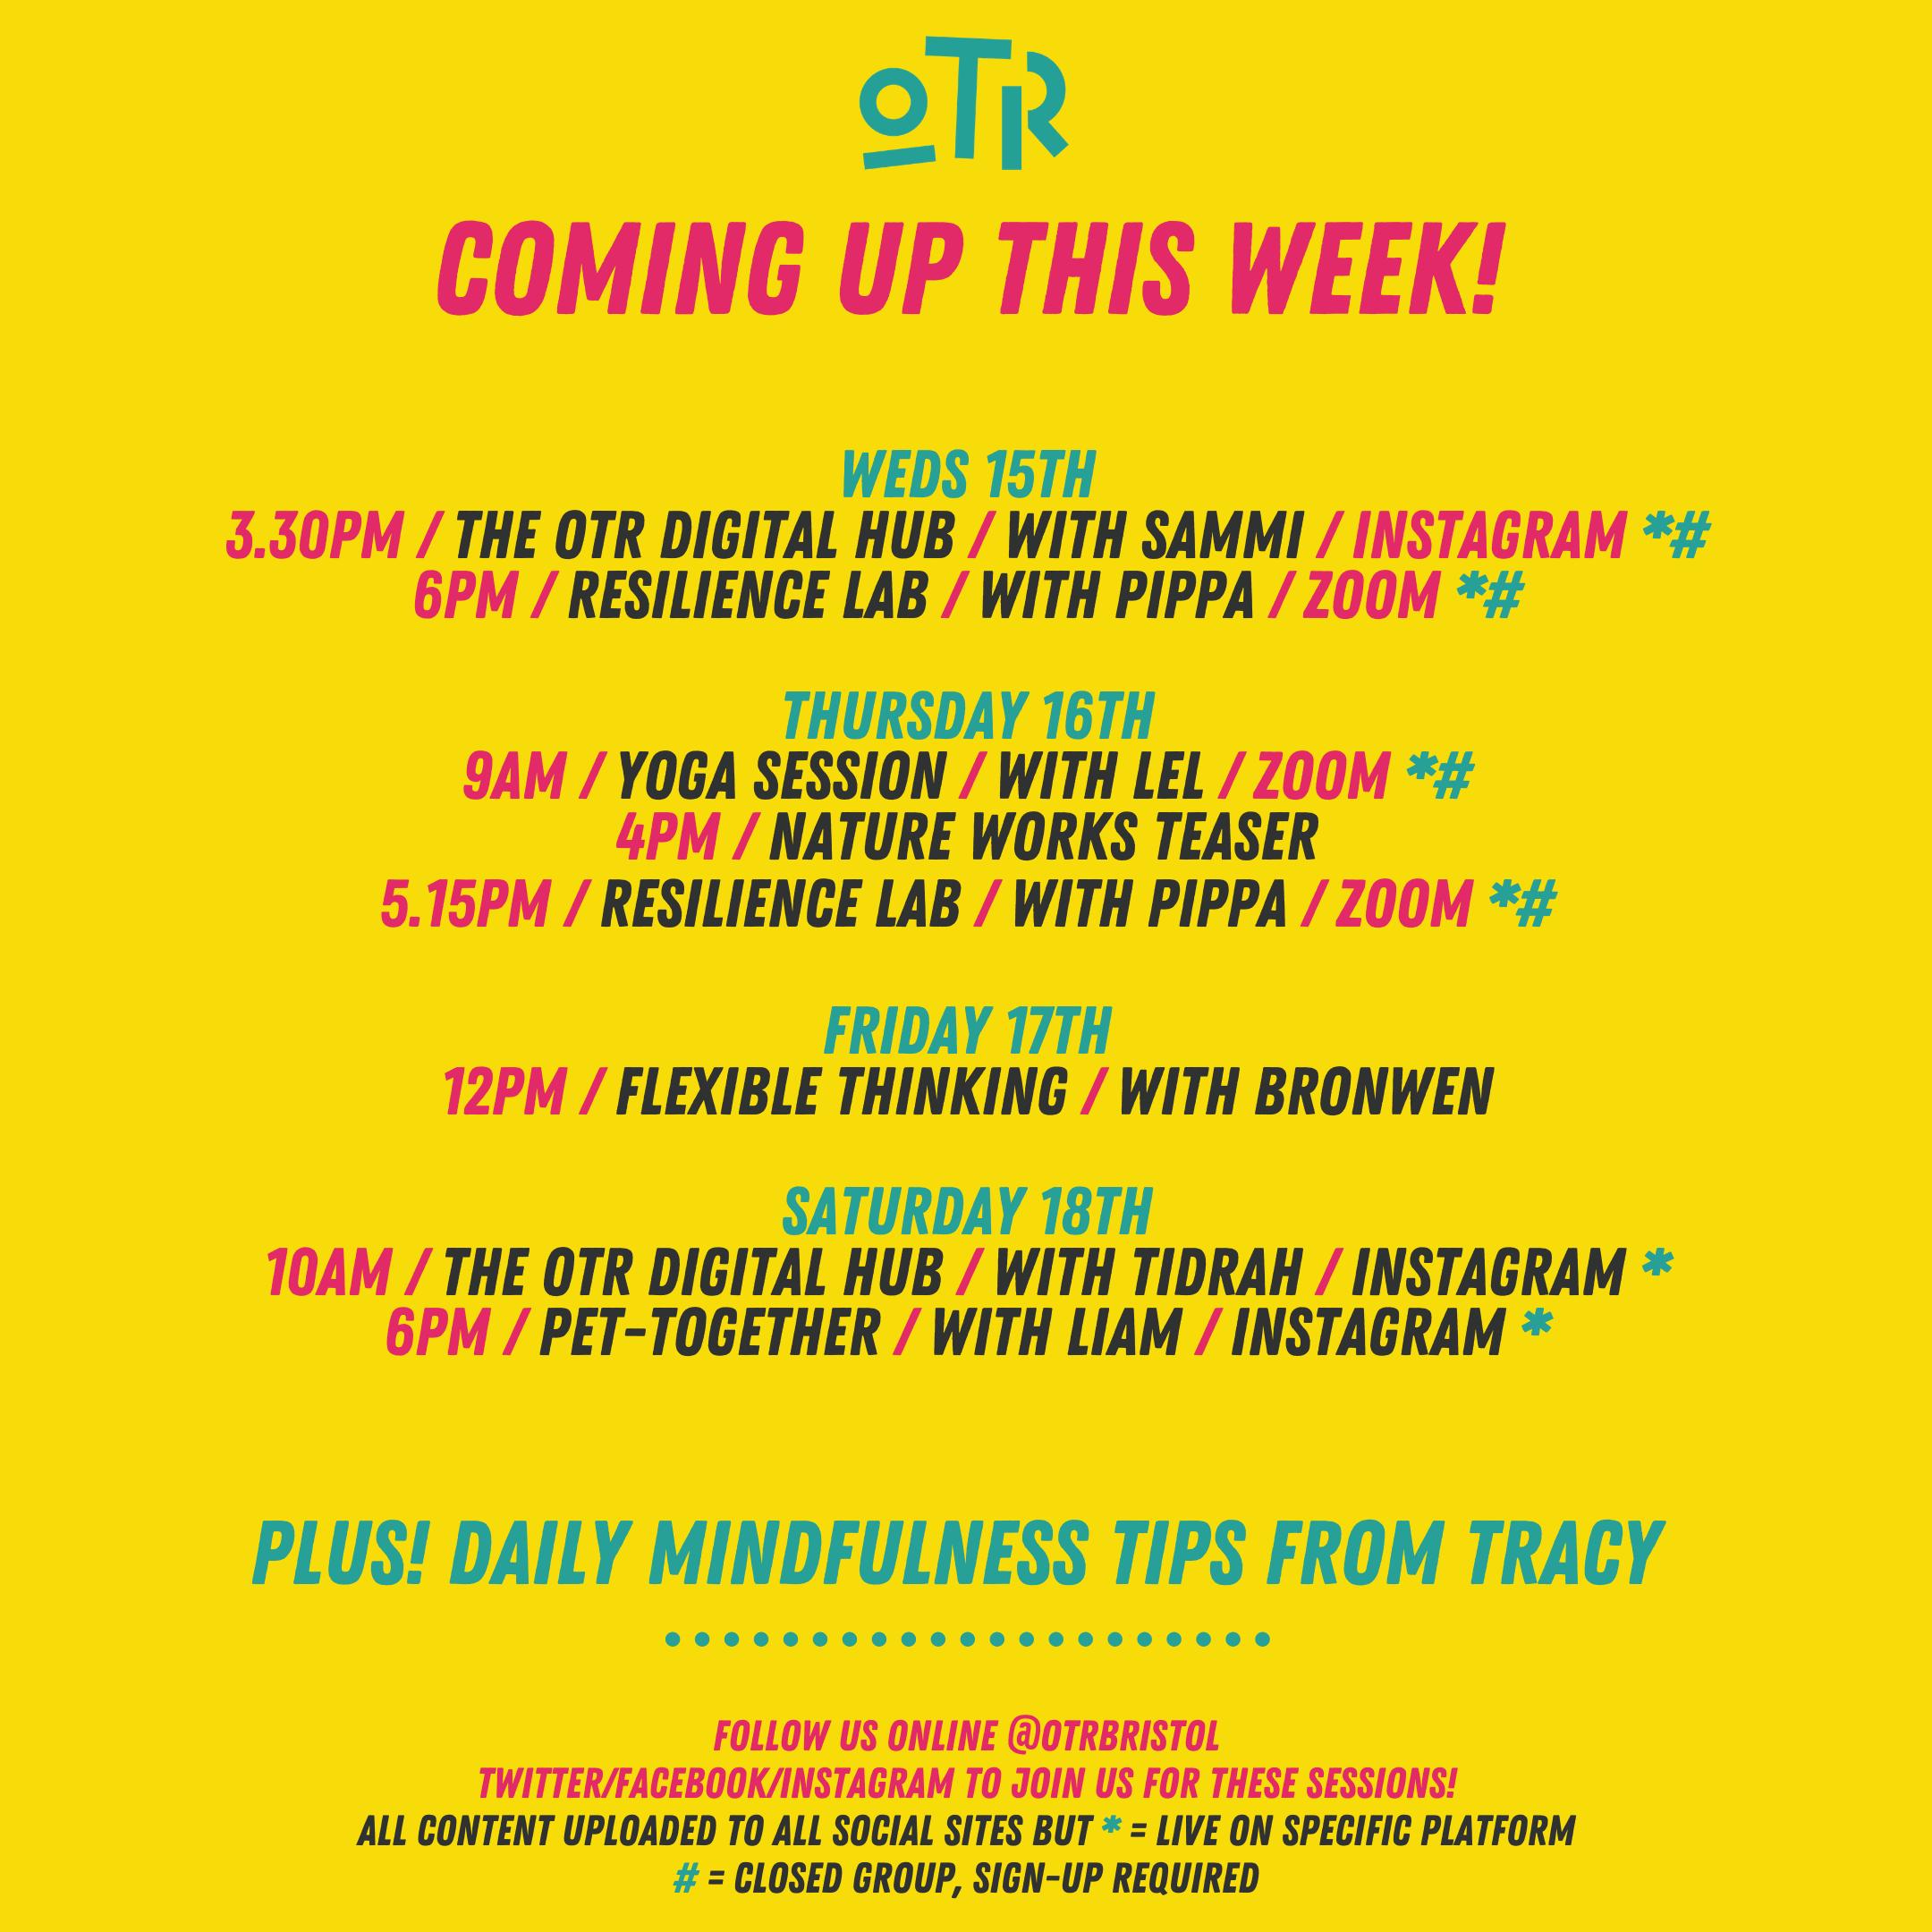 OTR's weekly schedule, w/c 13th April